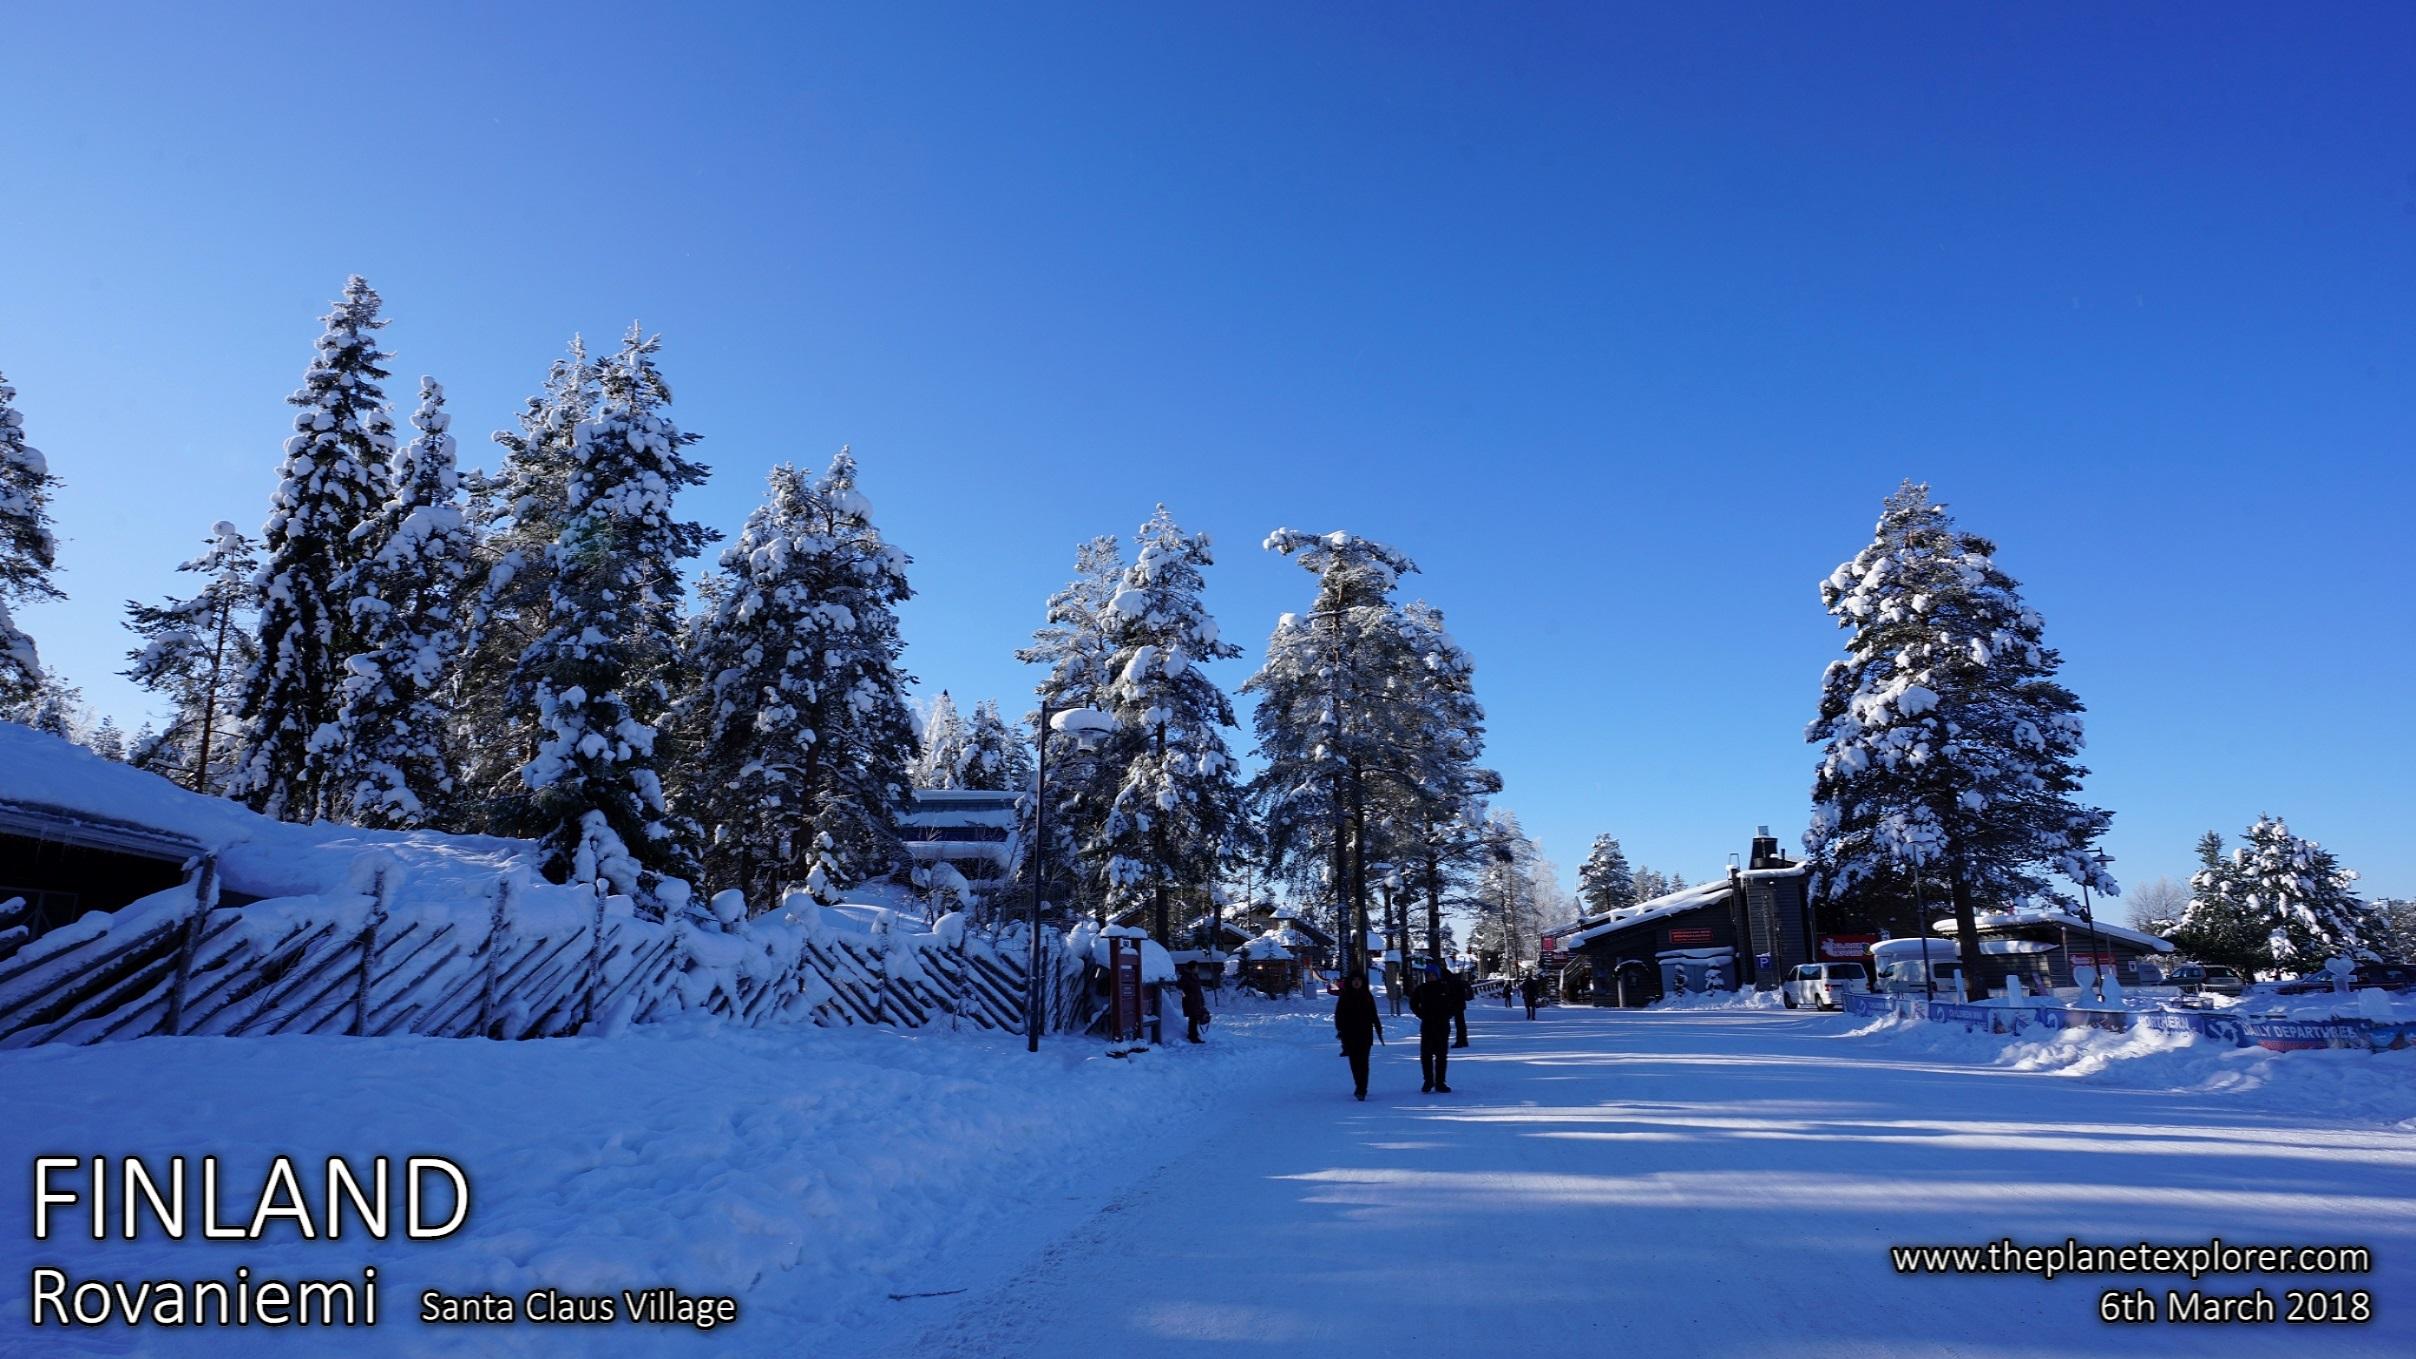 20180306_1151_Finland_Rovaniemi_Santa Claus Village_DSC09721_Sony a7R2_LR_@www